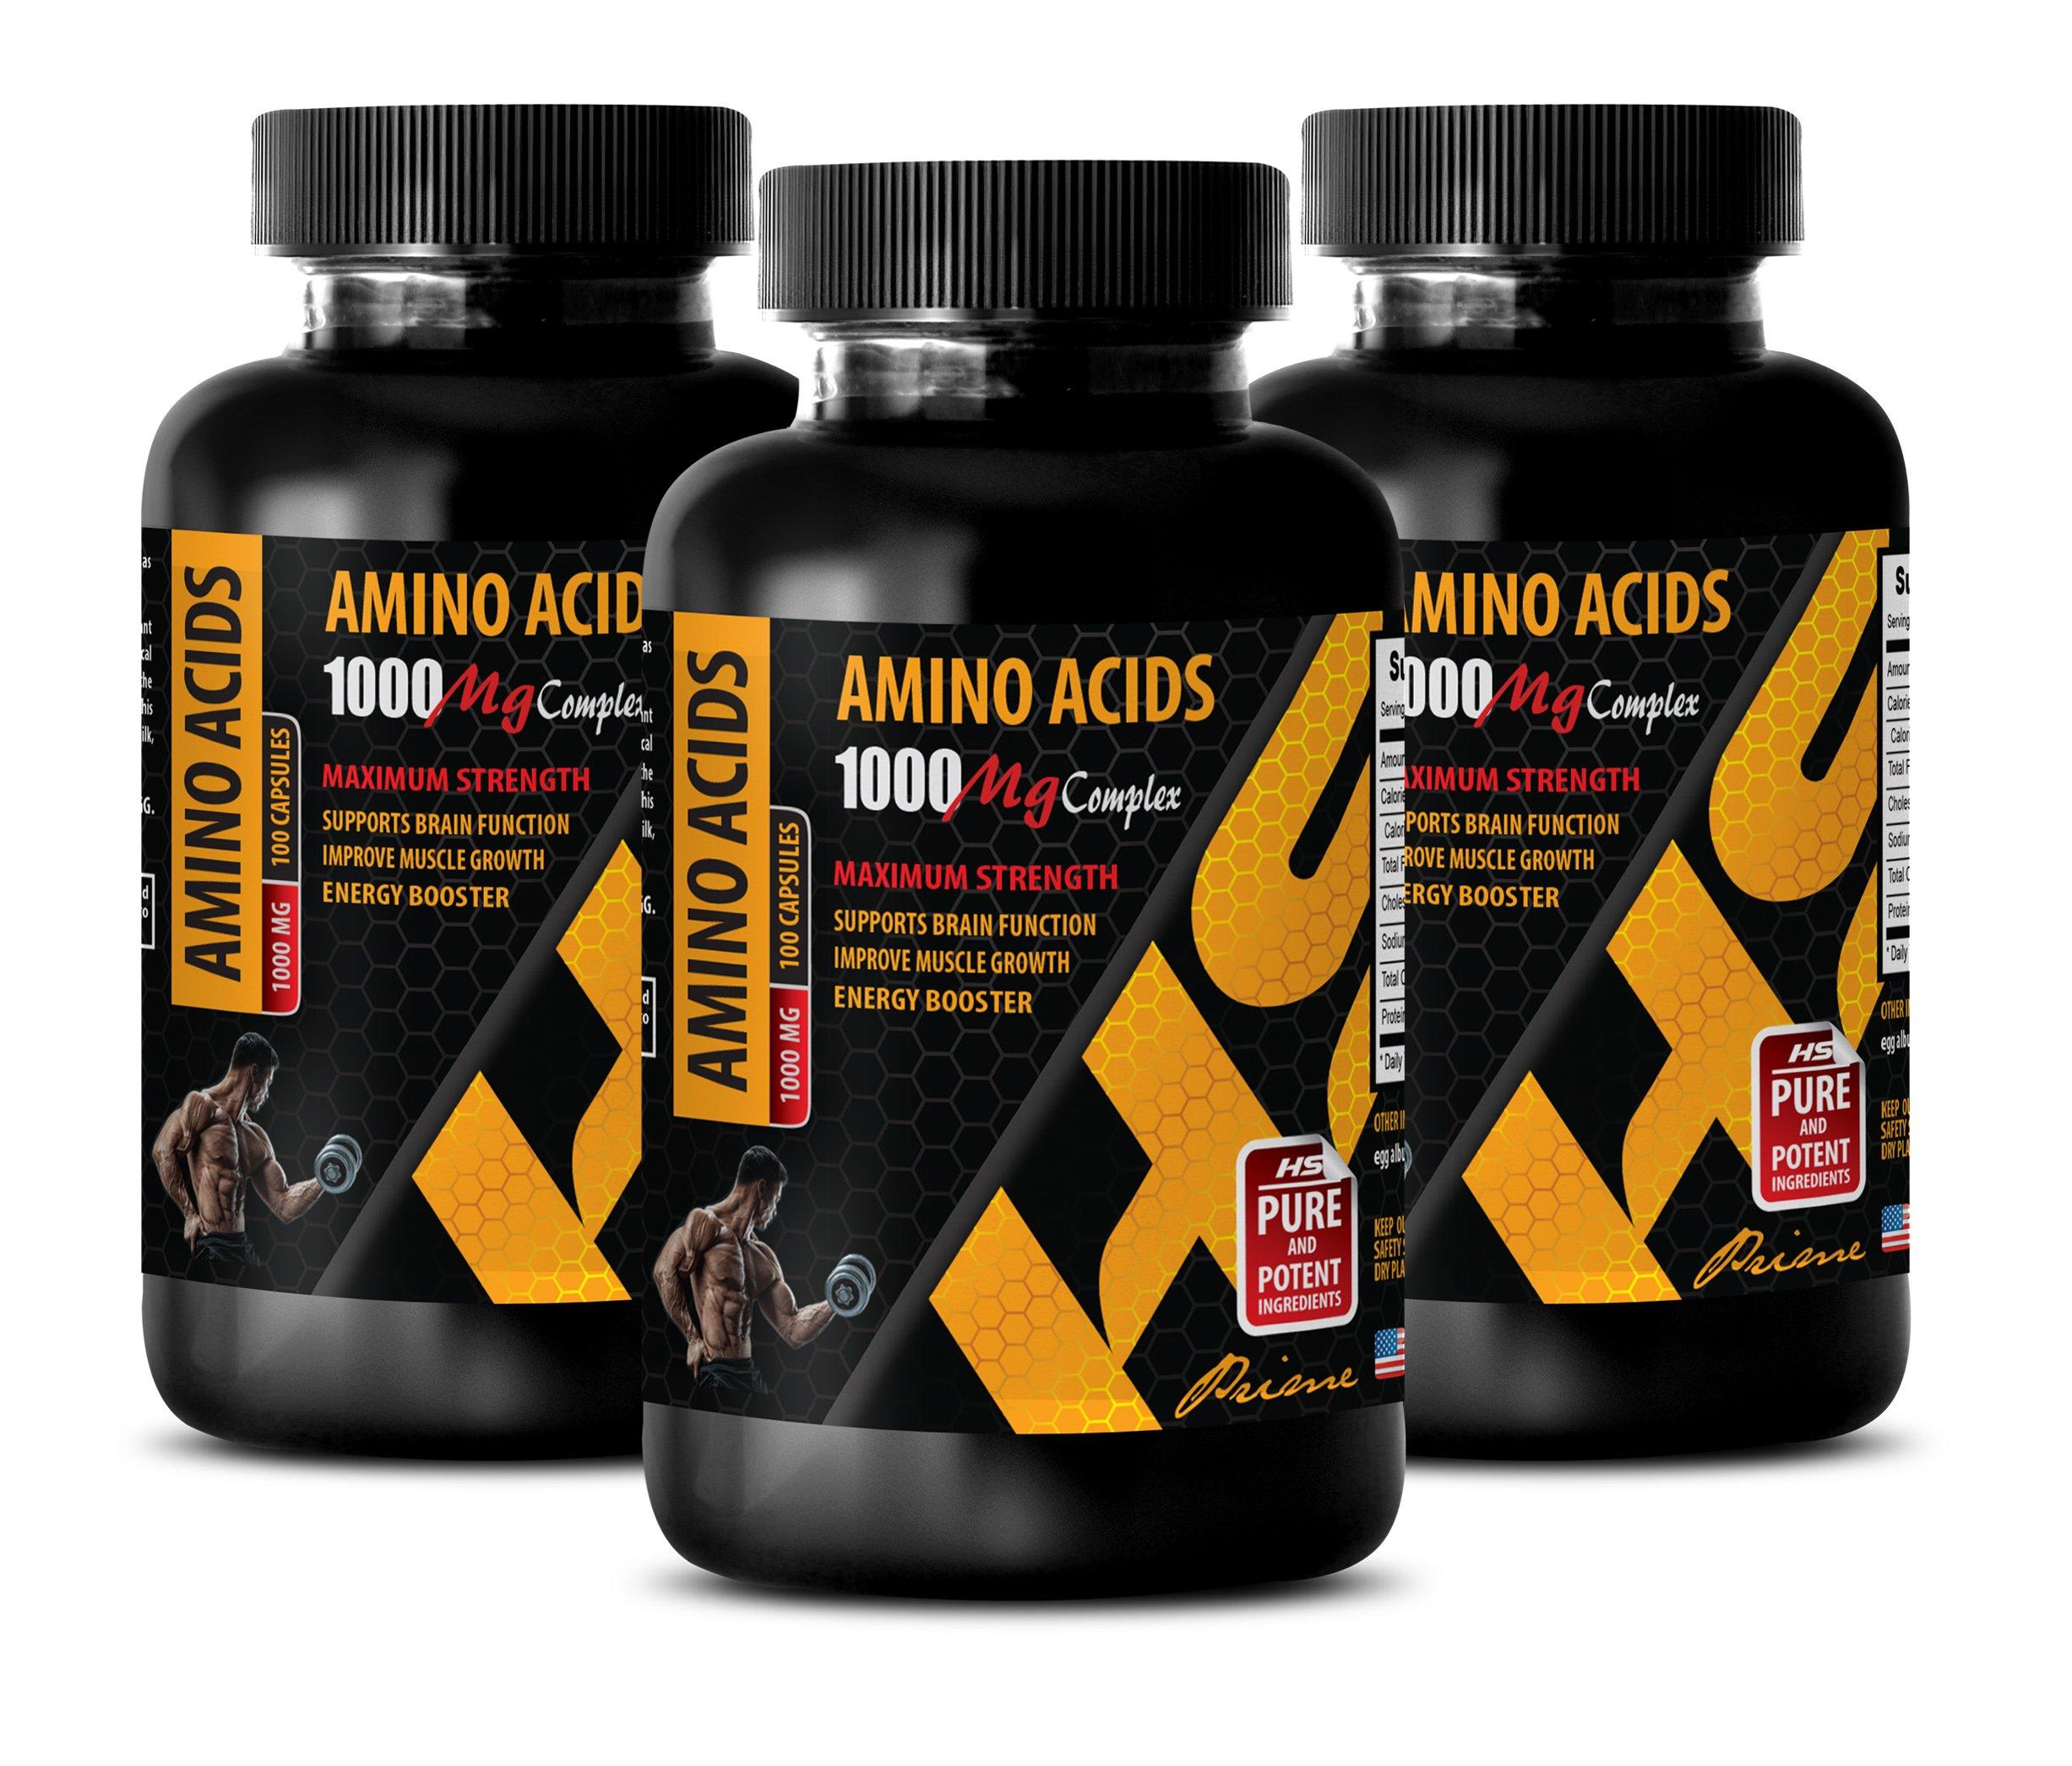 Vitamin Supplements Amino Acids